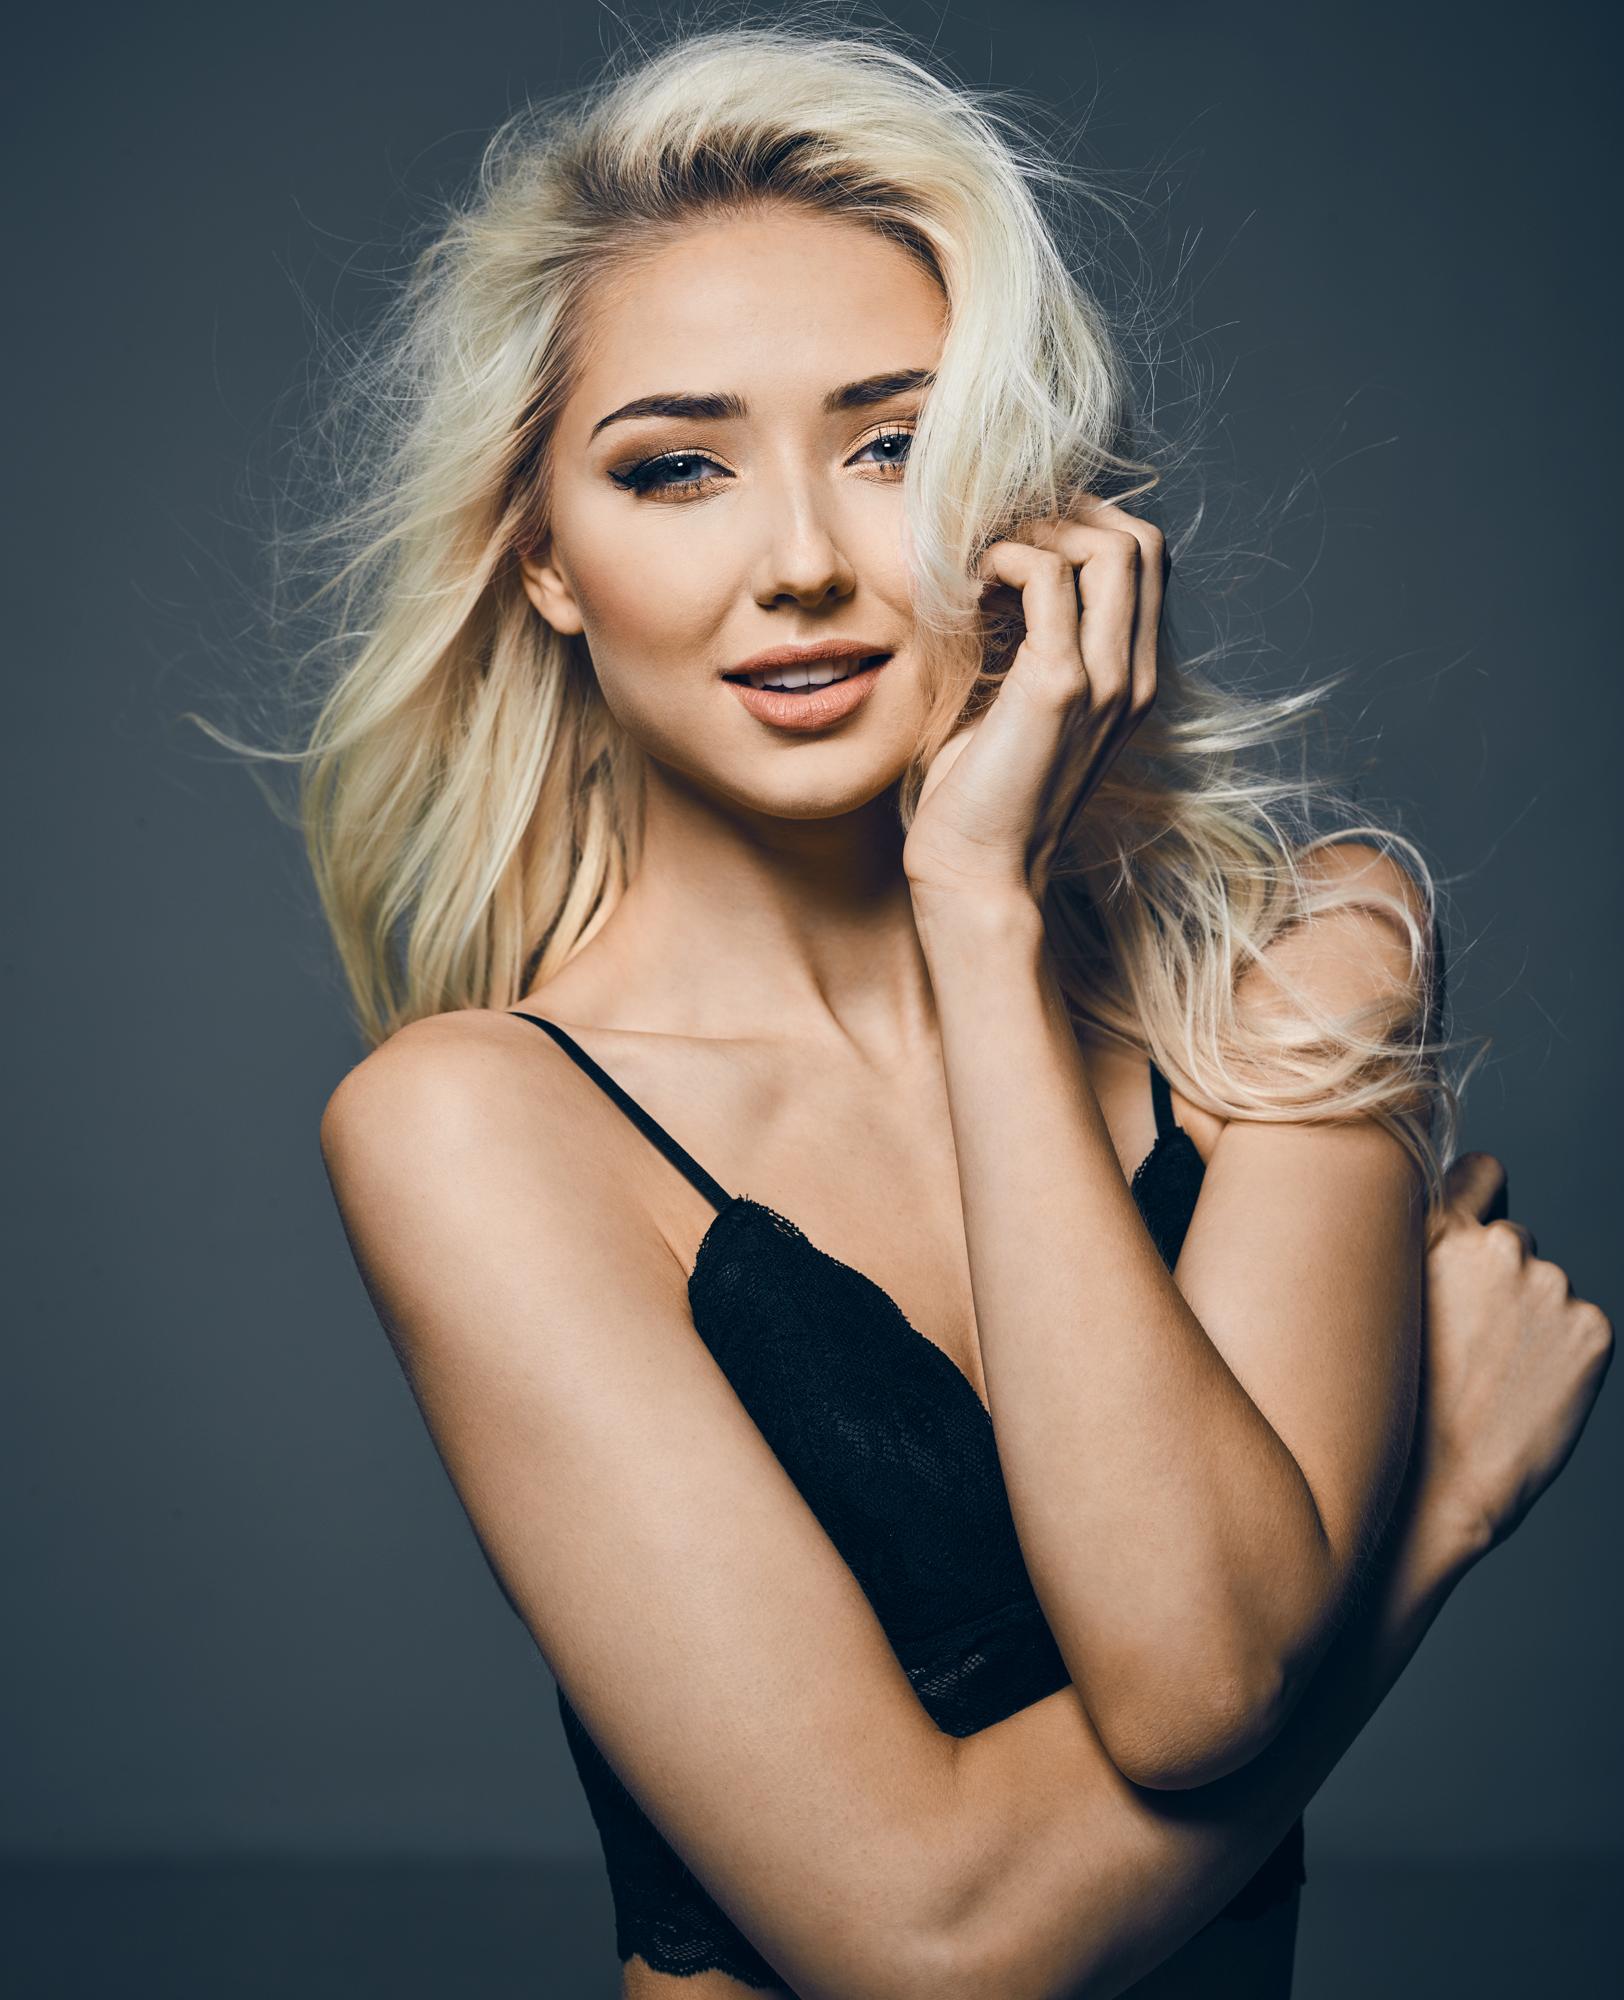 Thea Krag fotograf christian grüner blå øjne blondine top portræt